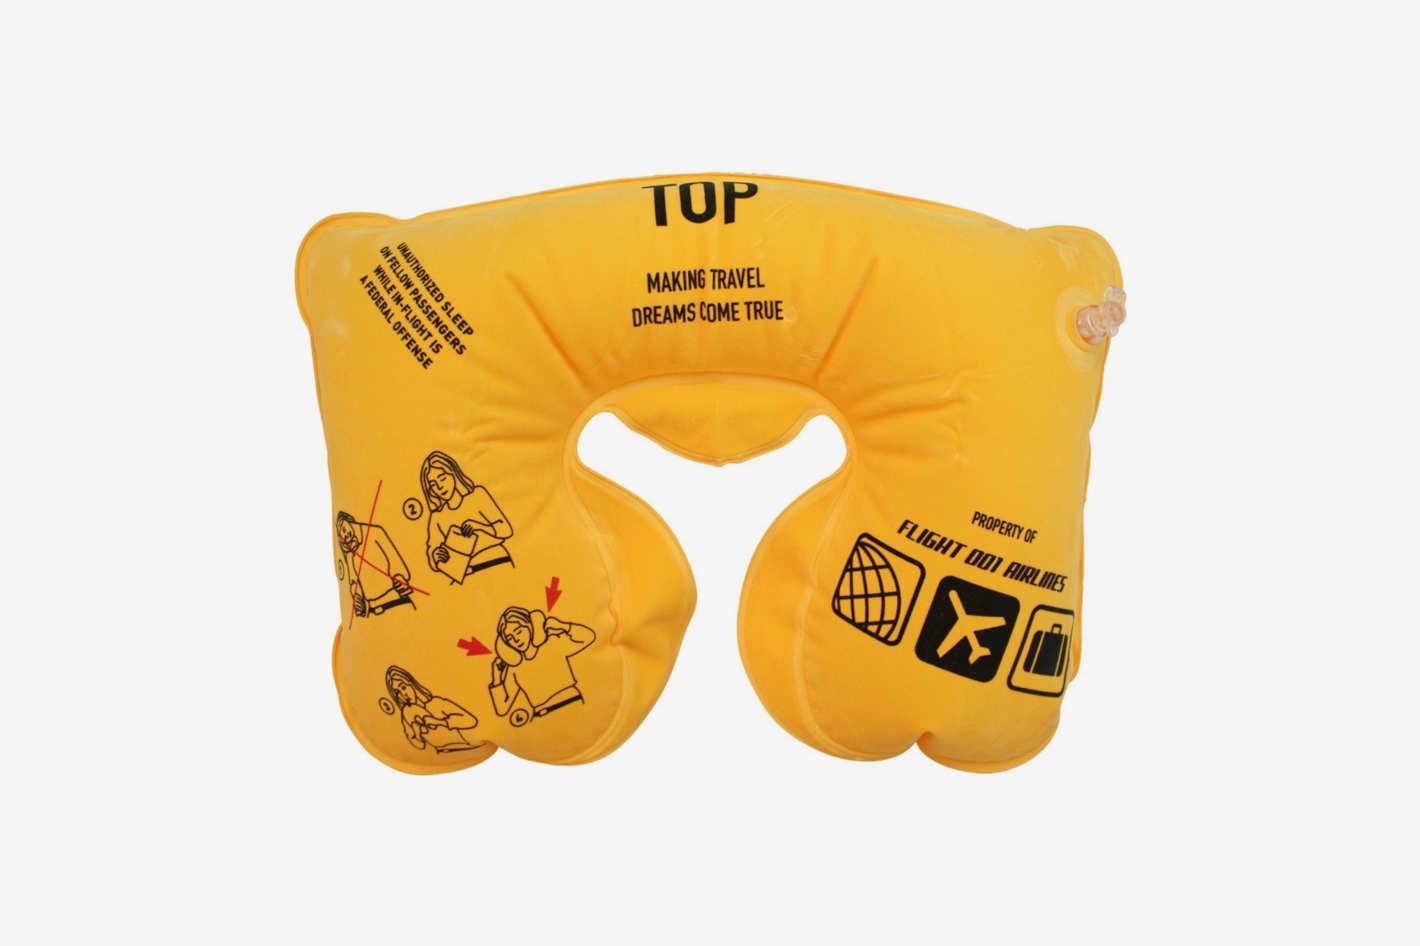 Flight 001 Air Supplies Inflatable Safety Neck Pillow